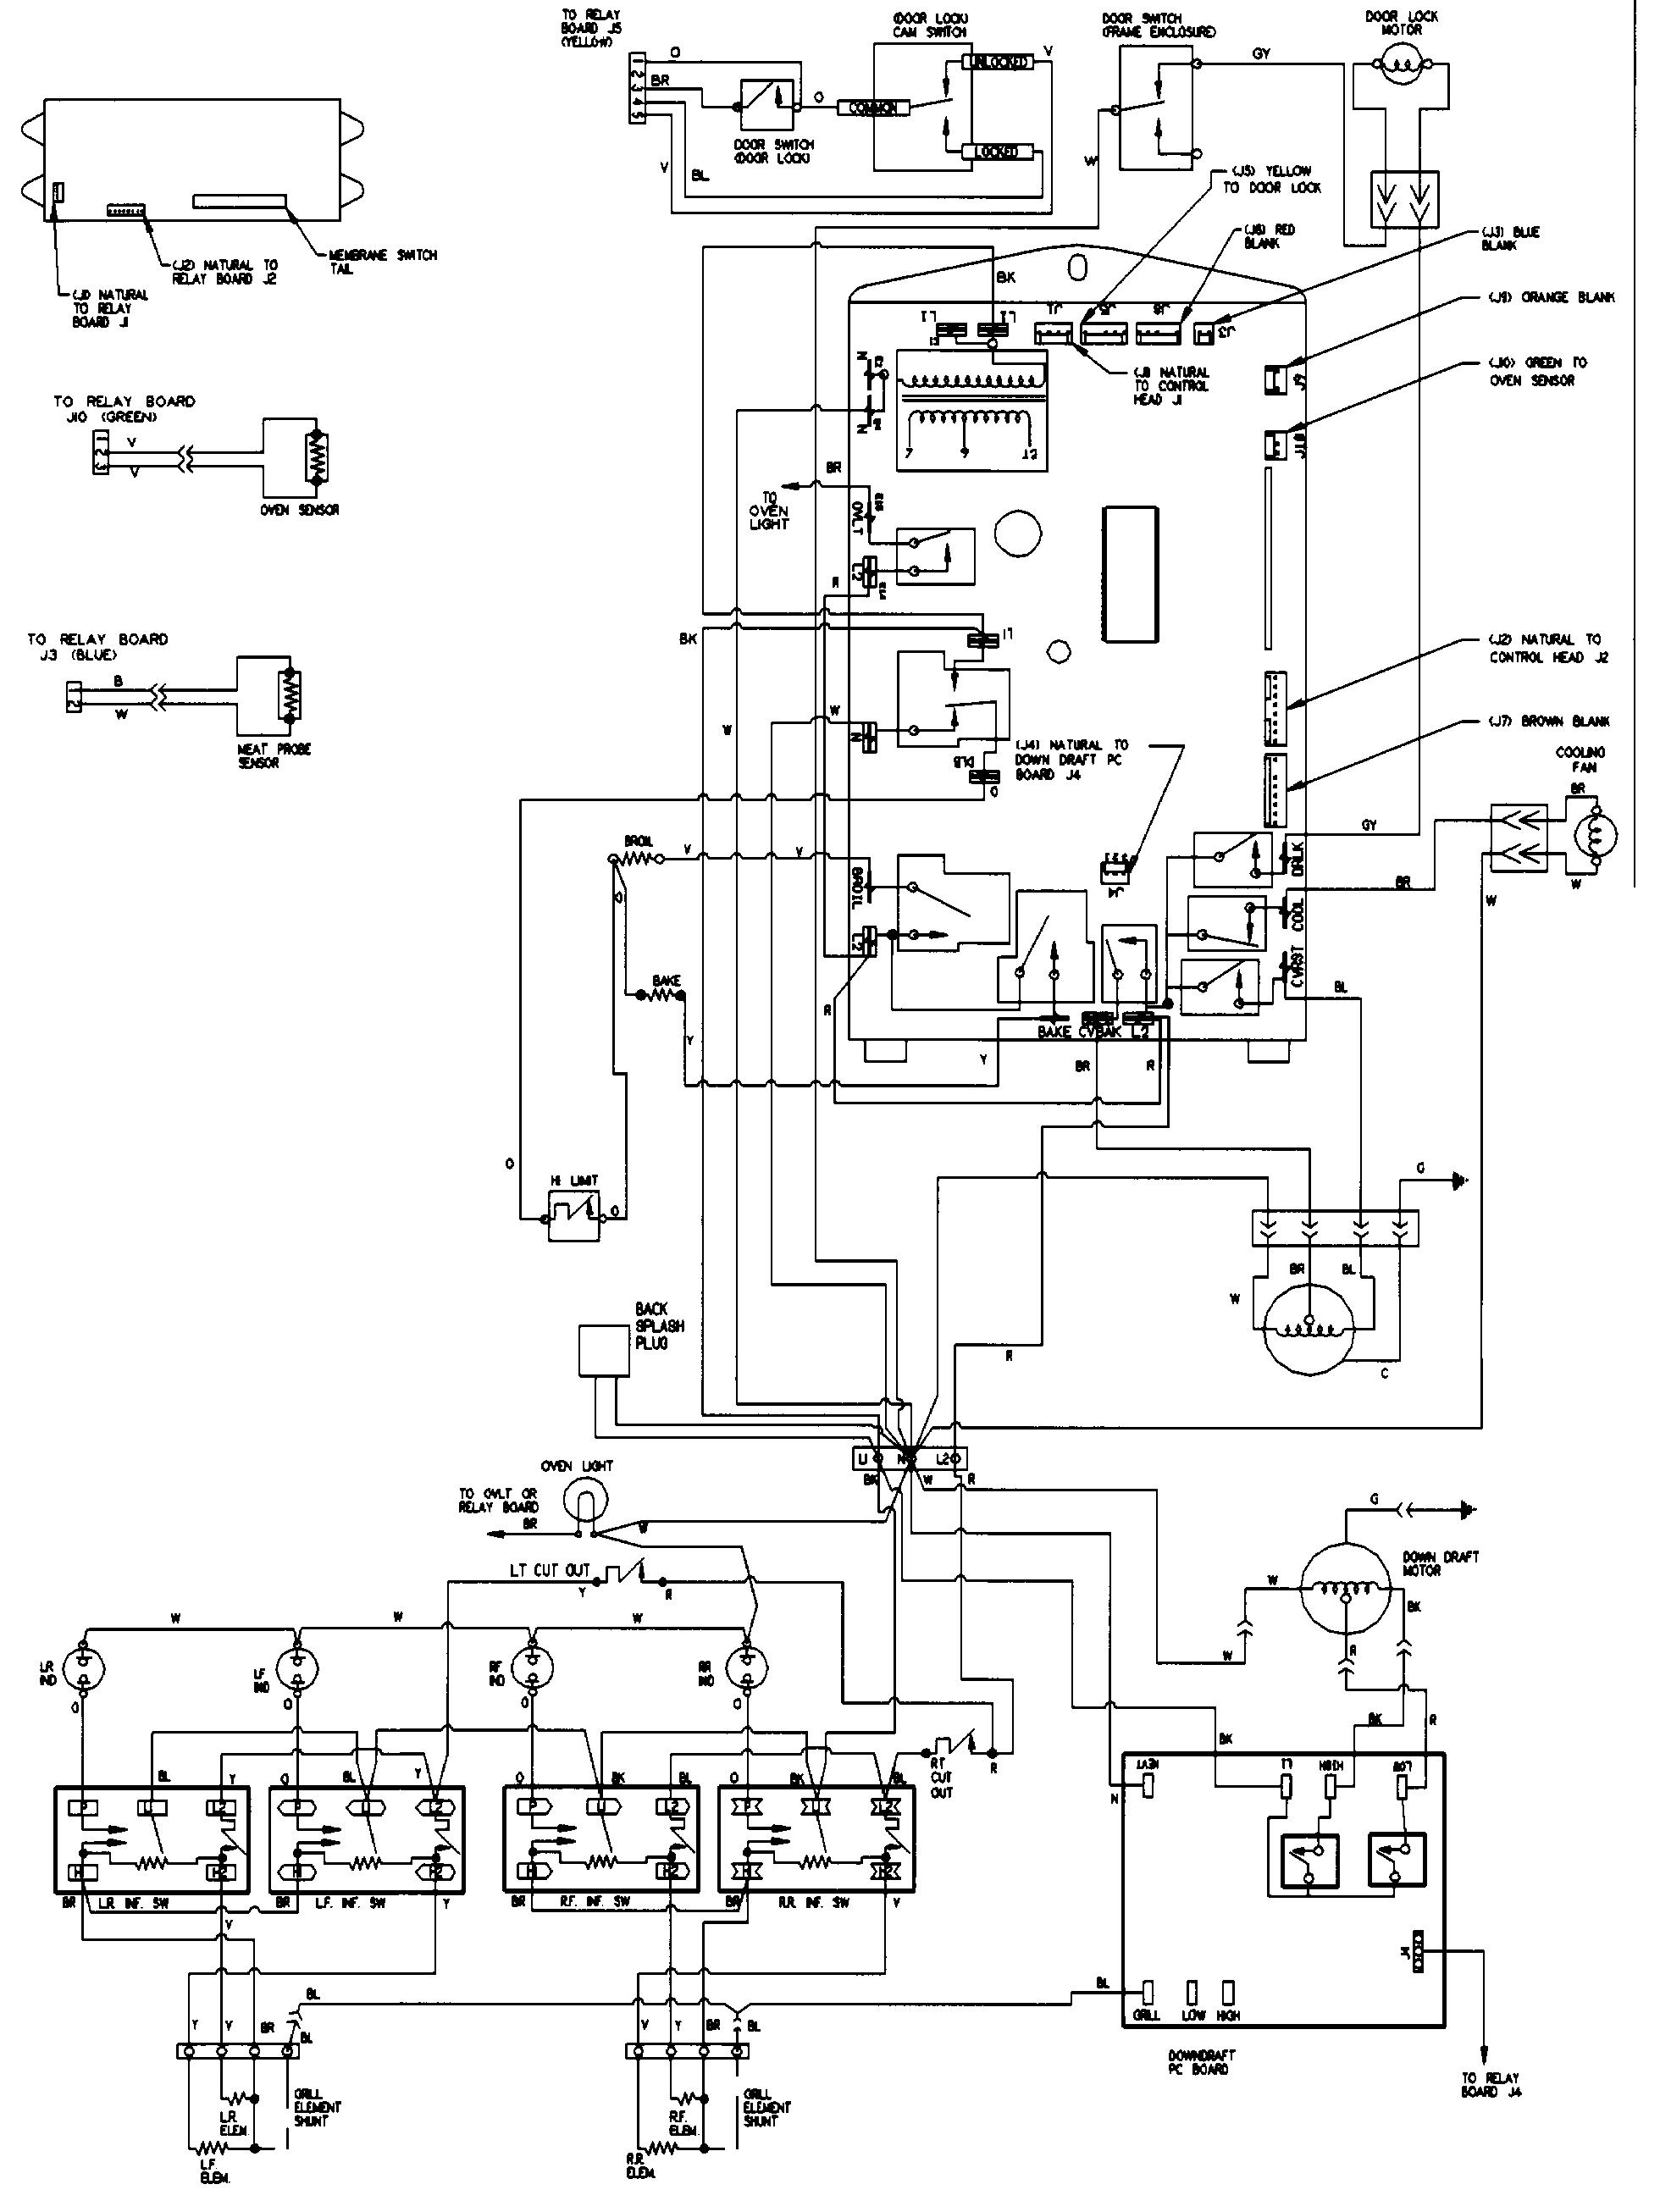 Kitchenaid Gas Grill Ignitor Wiring Diagram | Wiring Diagram - Grill Ignitor Wiring Diagram